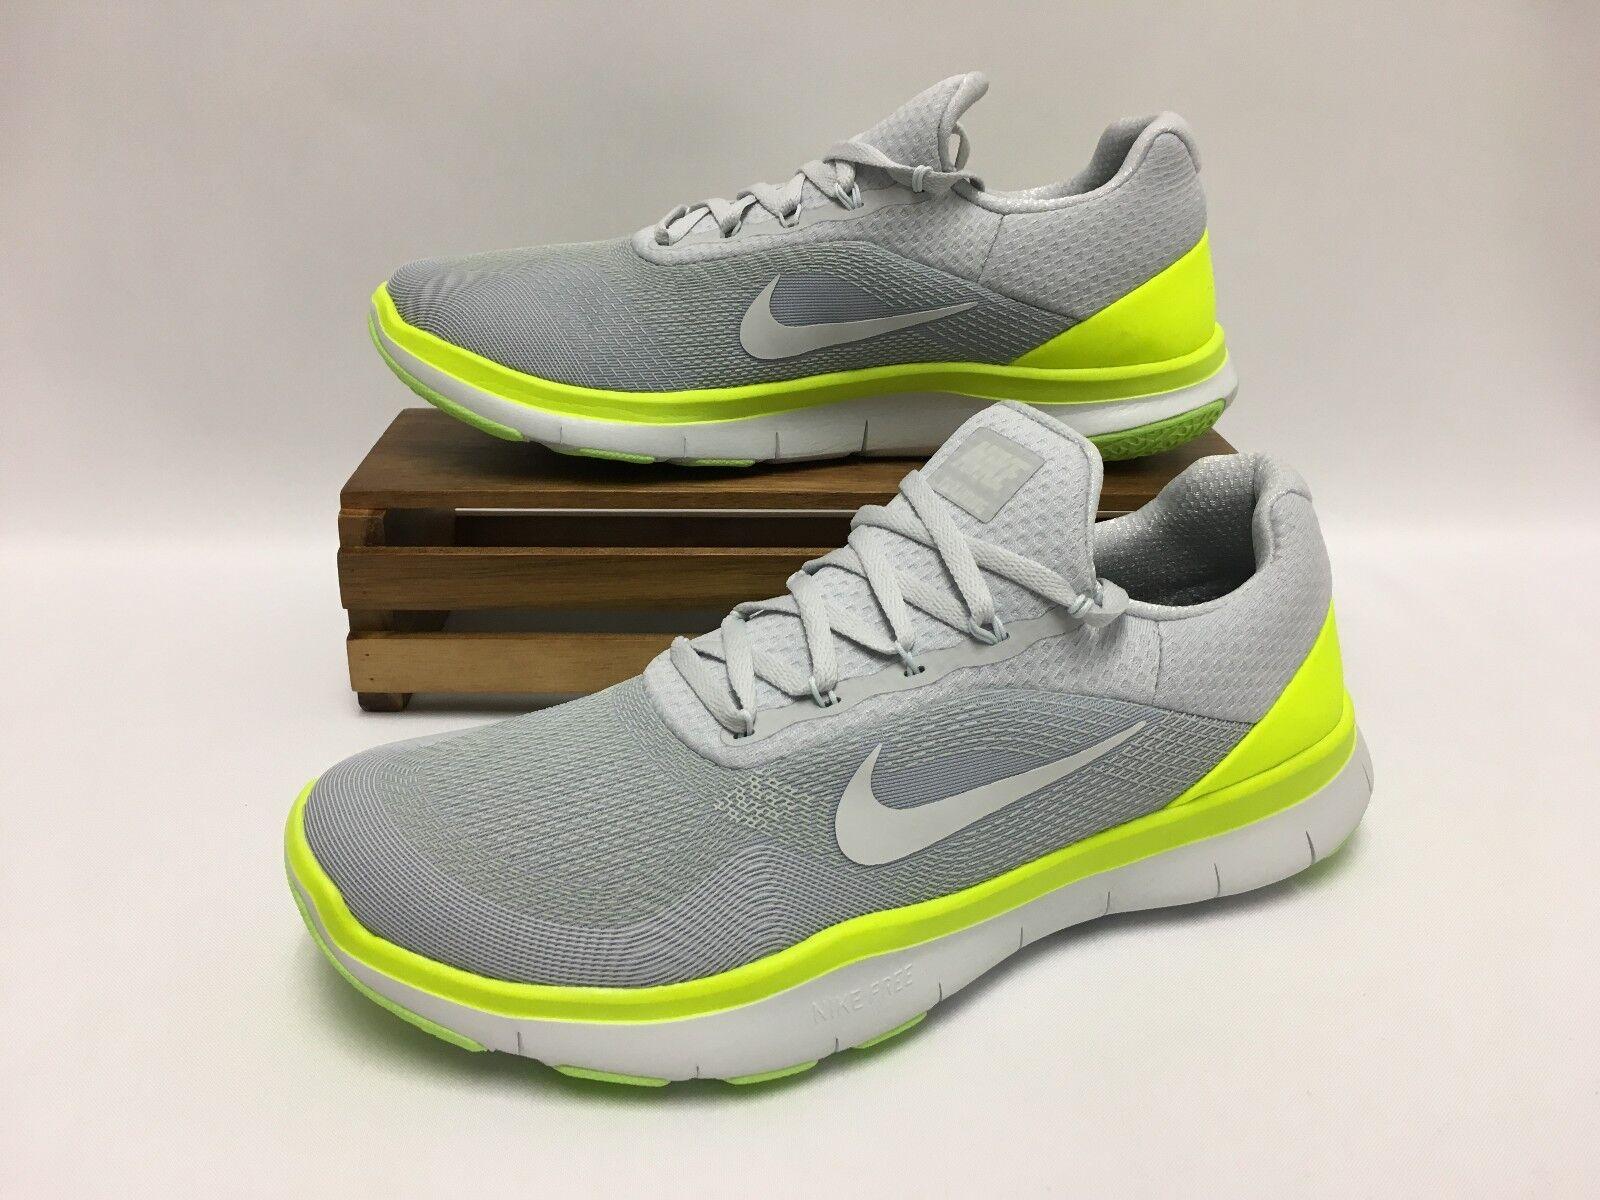 Nike Free Trainer V7 Training Shoes Gray White Volt 898053-002 Men's Size 9.5